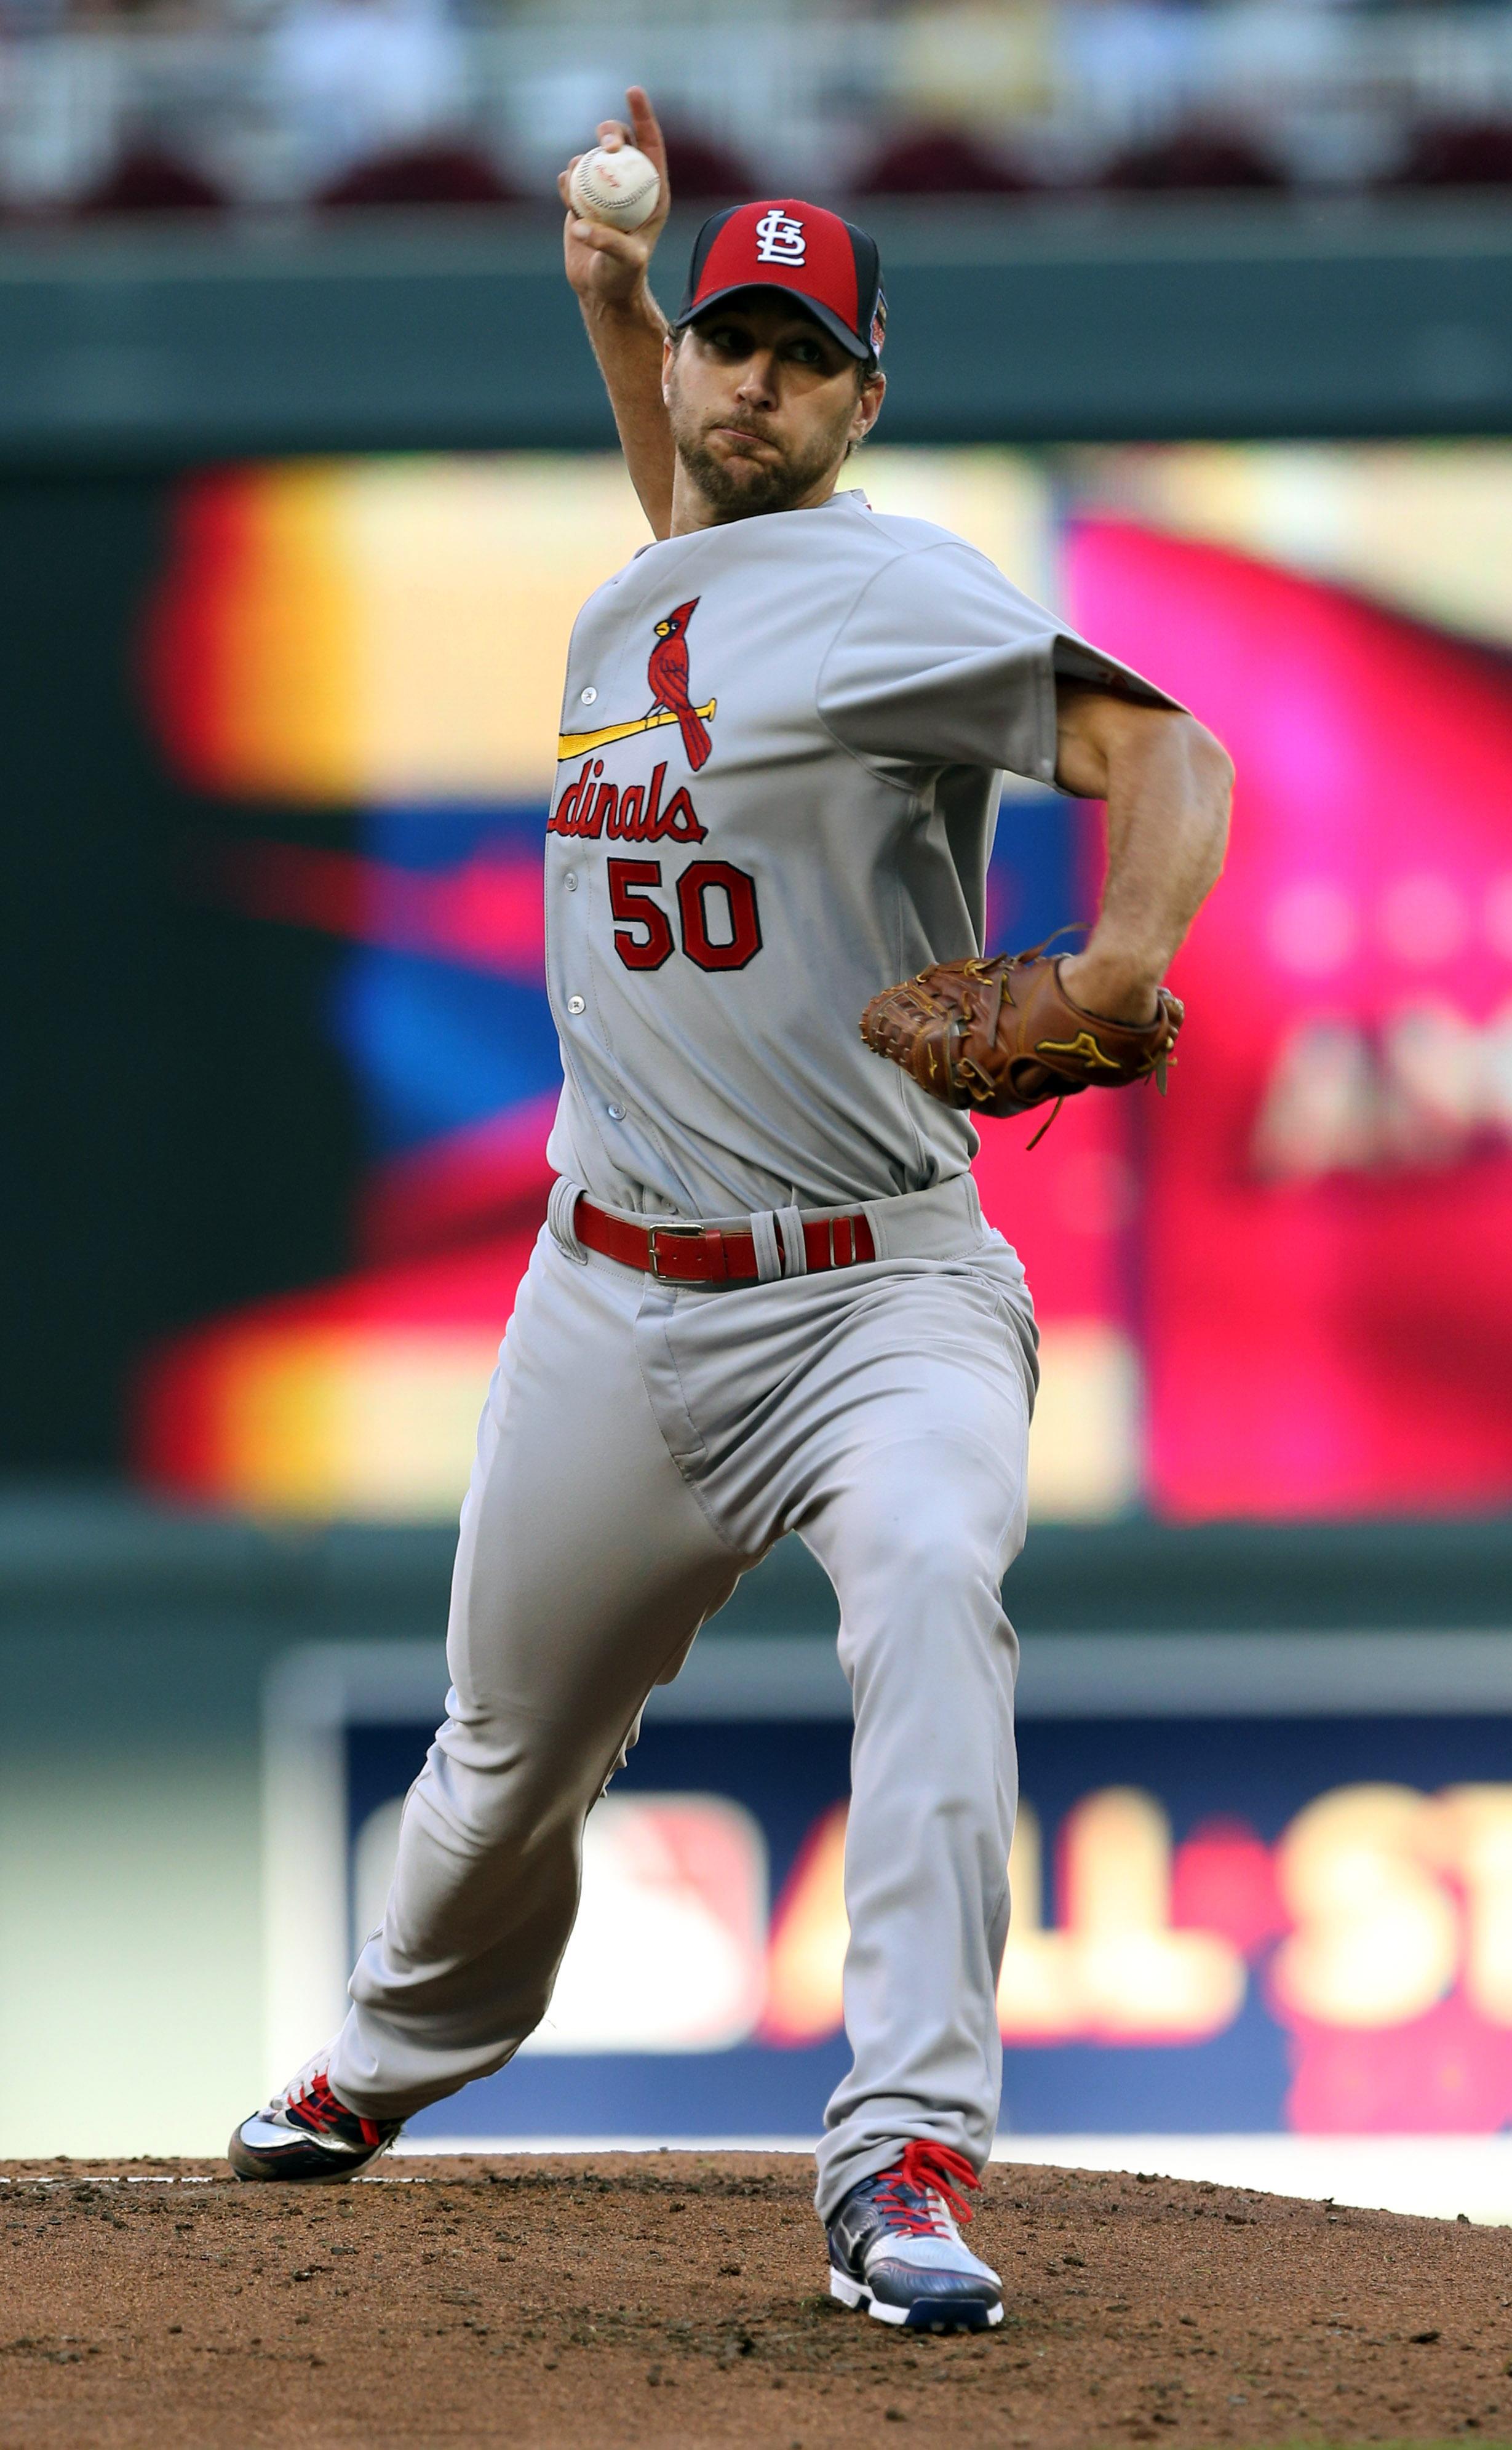 Wainwright blames self for Jeter flap